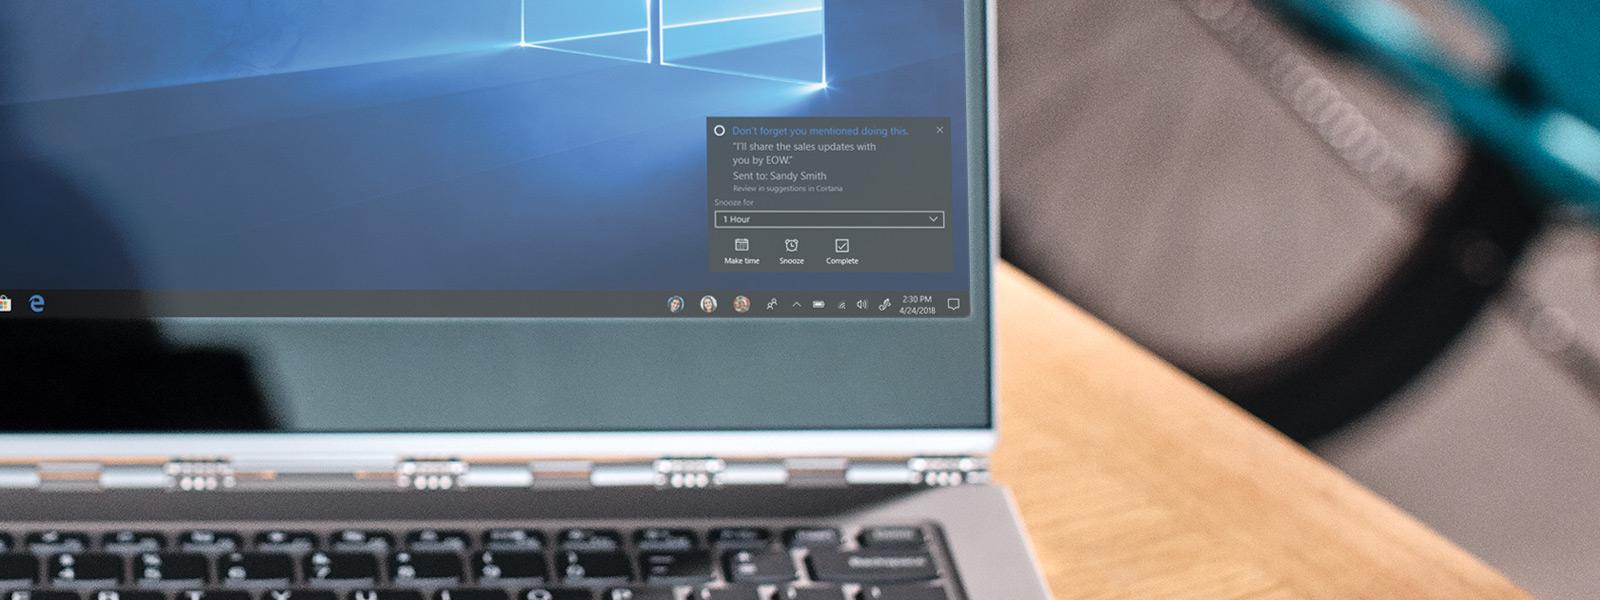 WinComm_EnhancedProductivity_1920_Panel3_Multifeature-Cortana